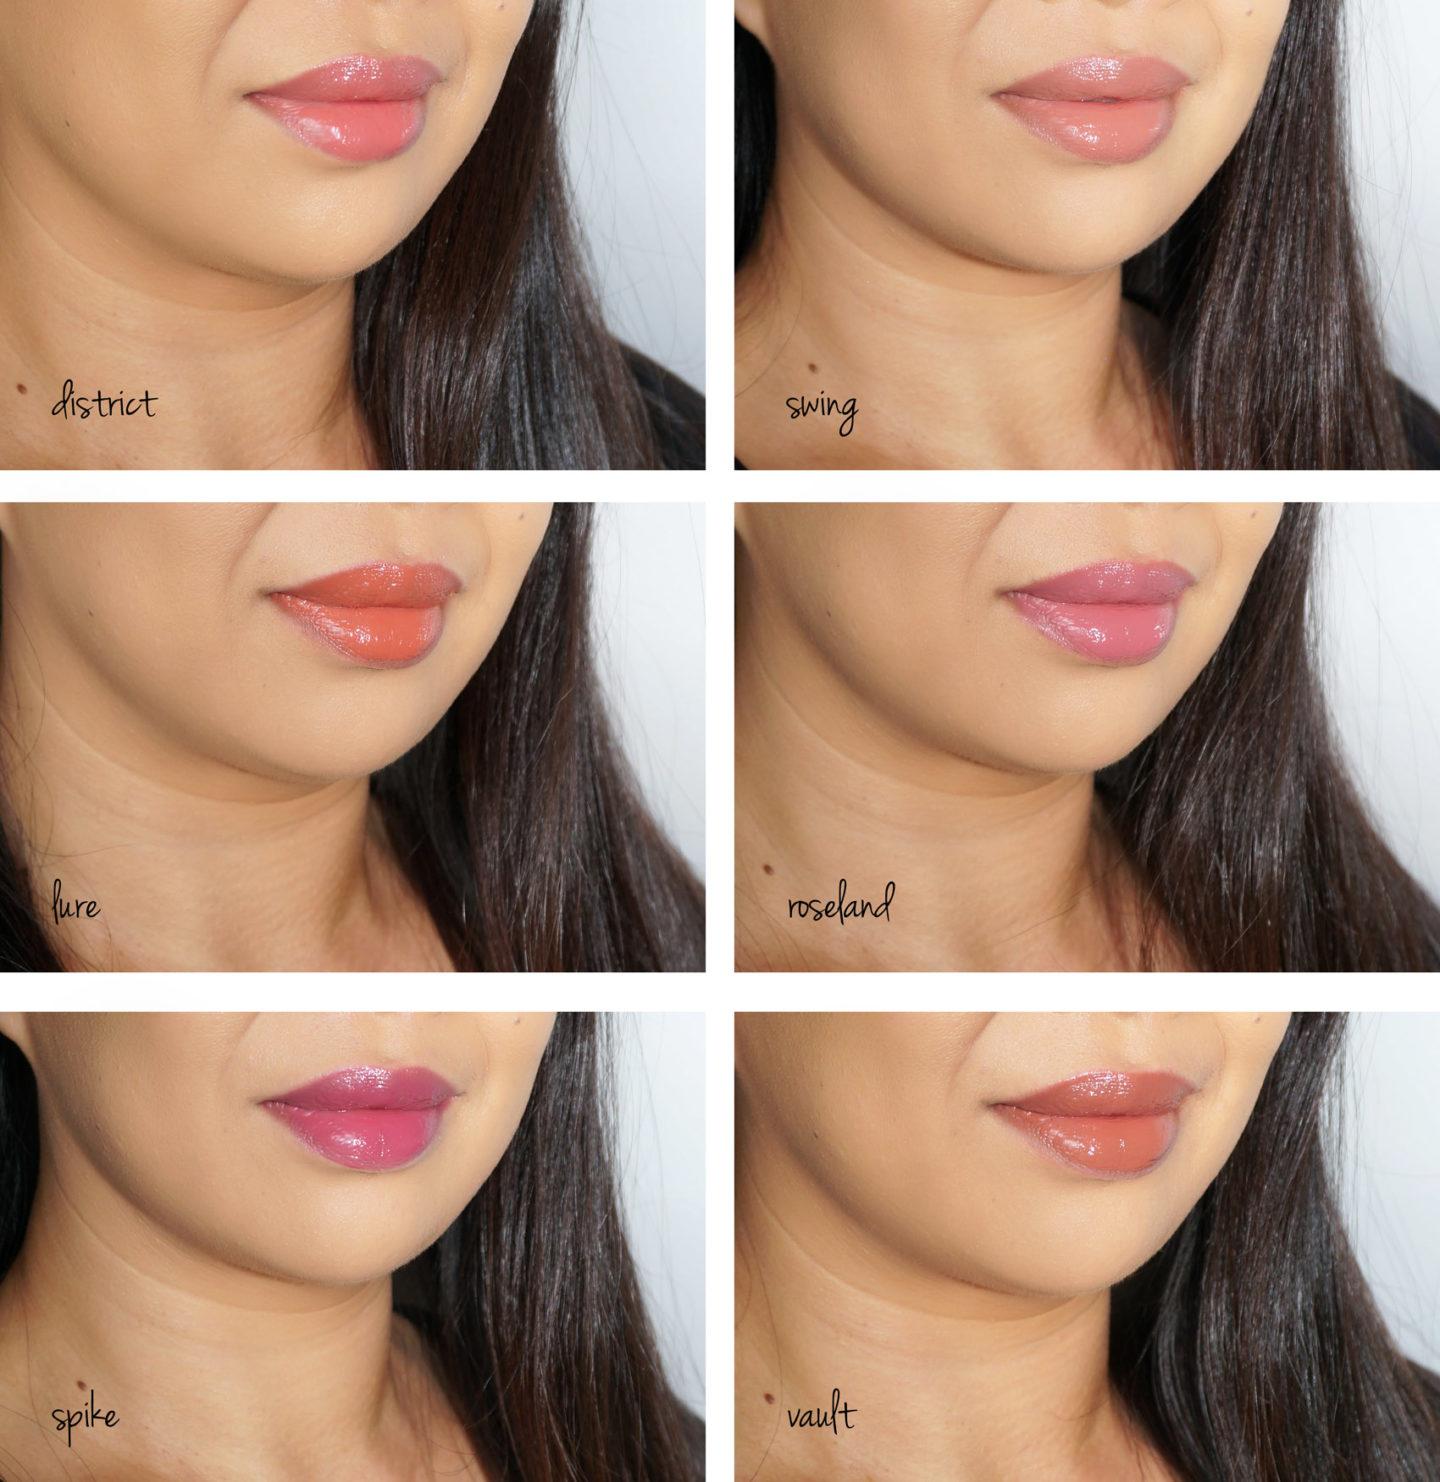 NARS Ulta Velvet Lip Glide Swatches District, Balançoire, Lure, Roseland, Spike, Vault